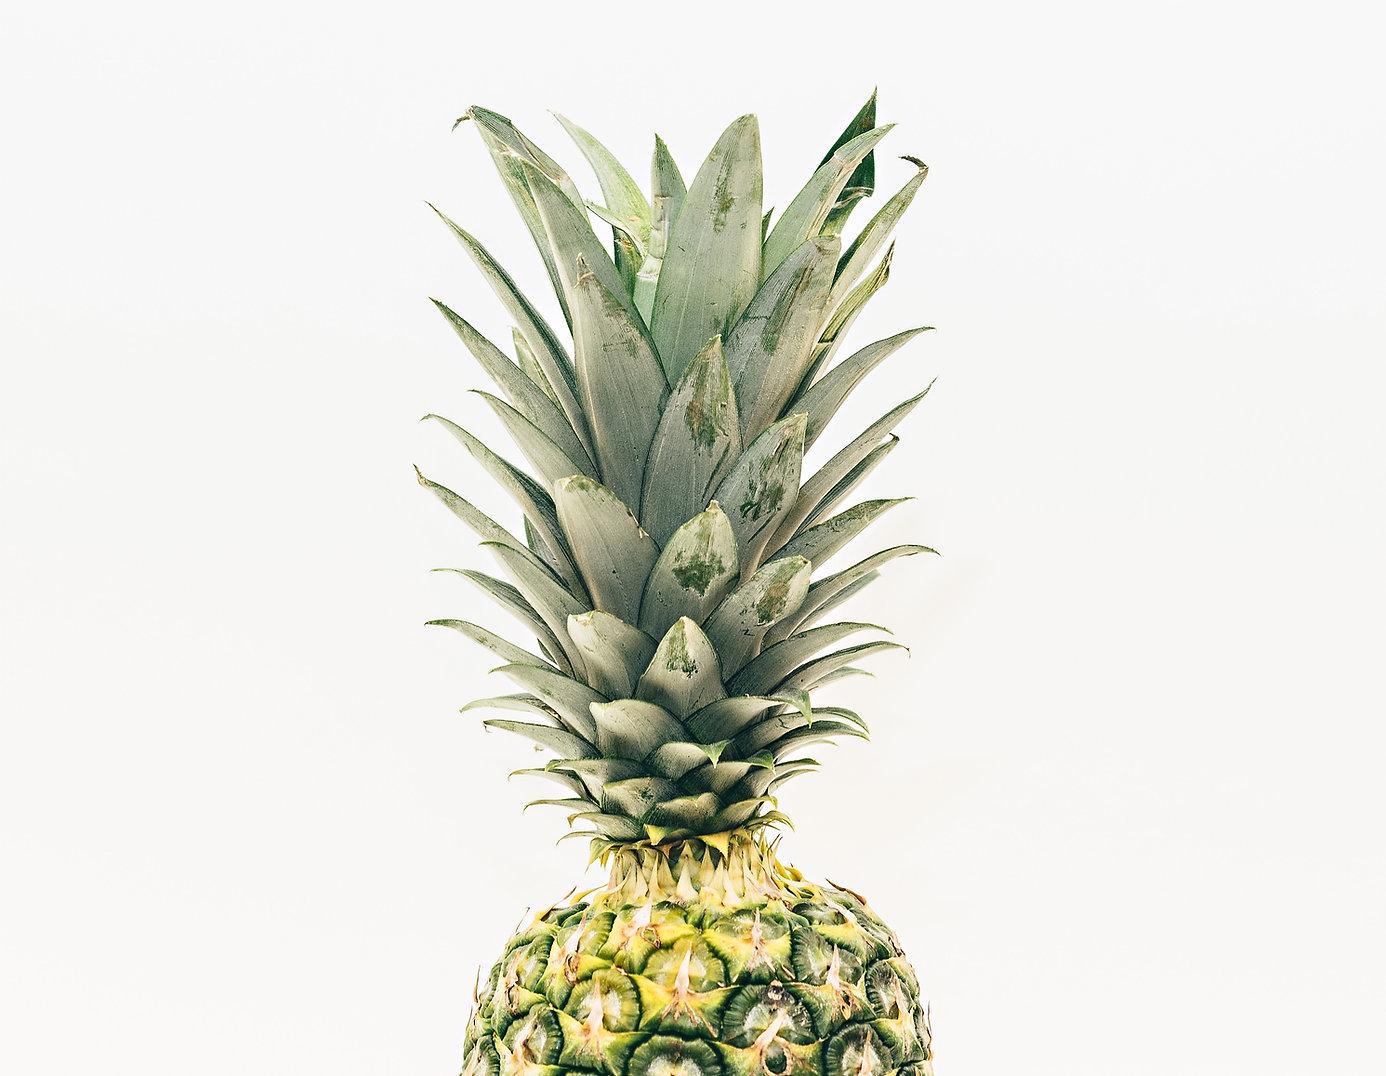 pineapple-supply-co-262624-unsplash.jpg